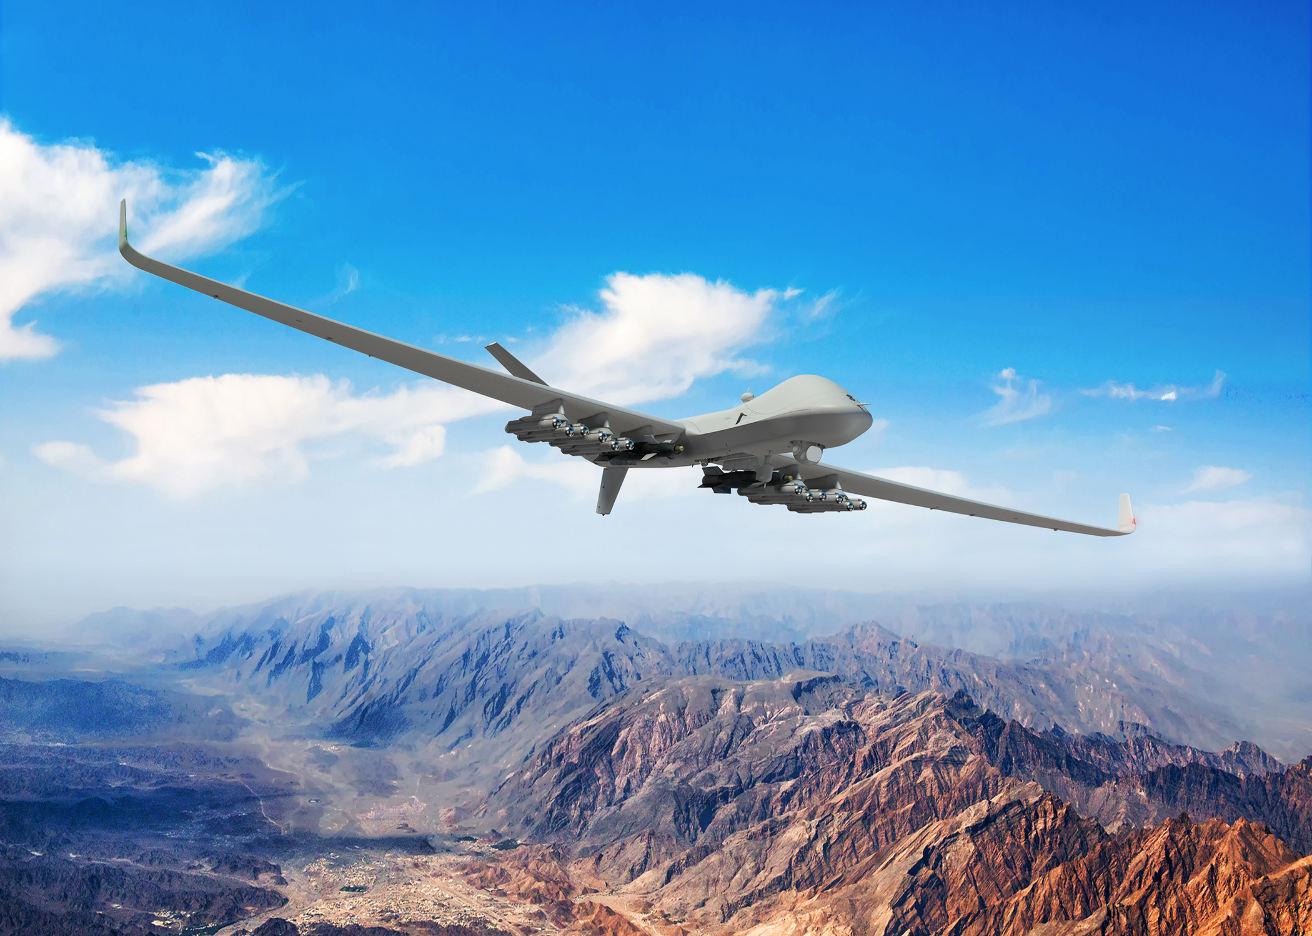 MBDA Brimstone missile planned for RAF Protector RPAS